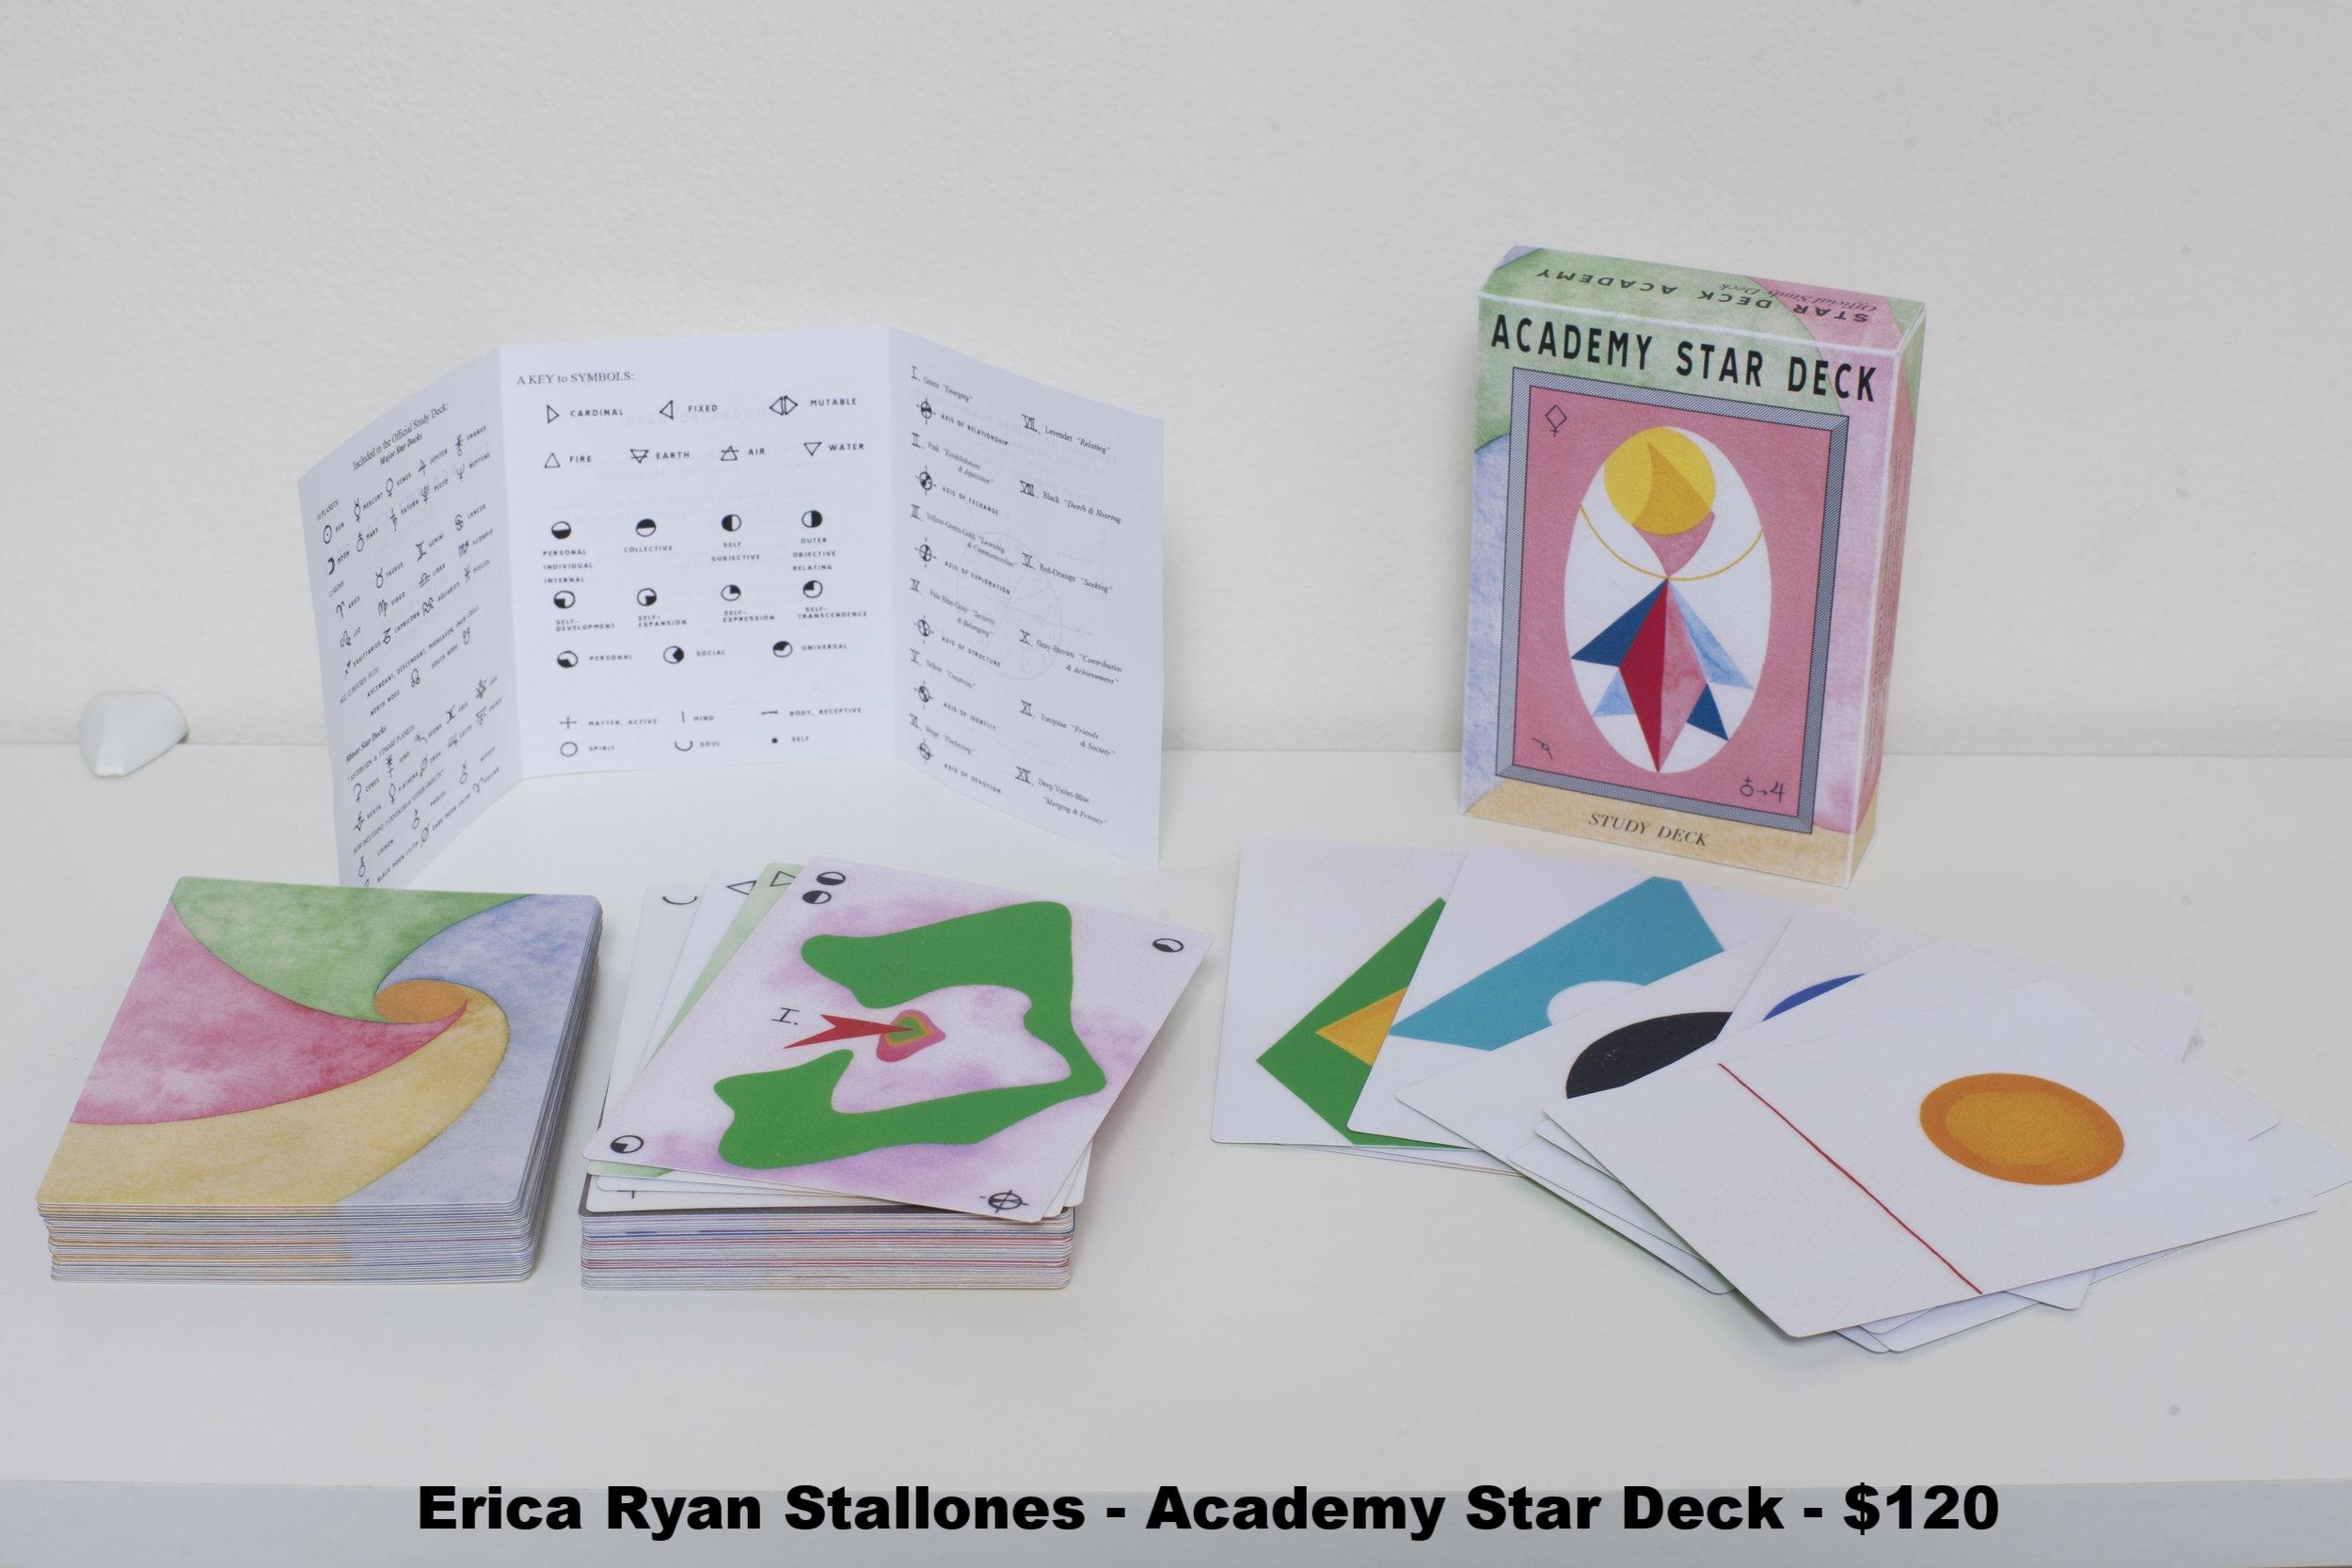 Erica Ryan Stallones_AcademyStarDeck.jpg